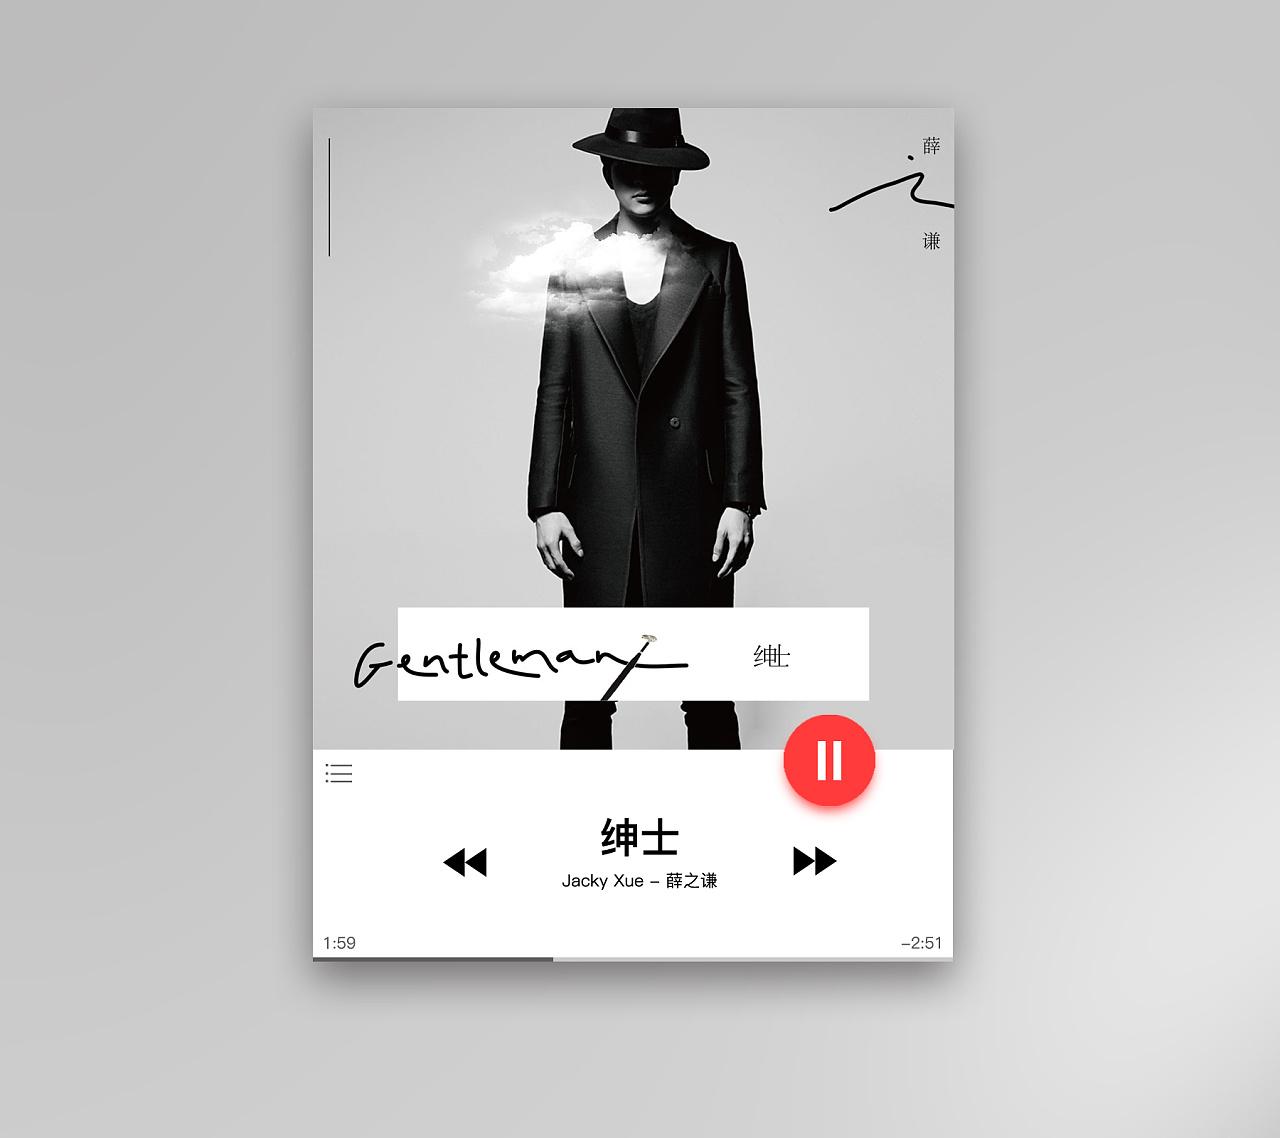 Daily UI 004 Simple Music Player  UI APP界面 万瑞森- 原创